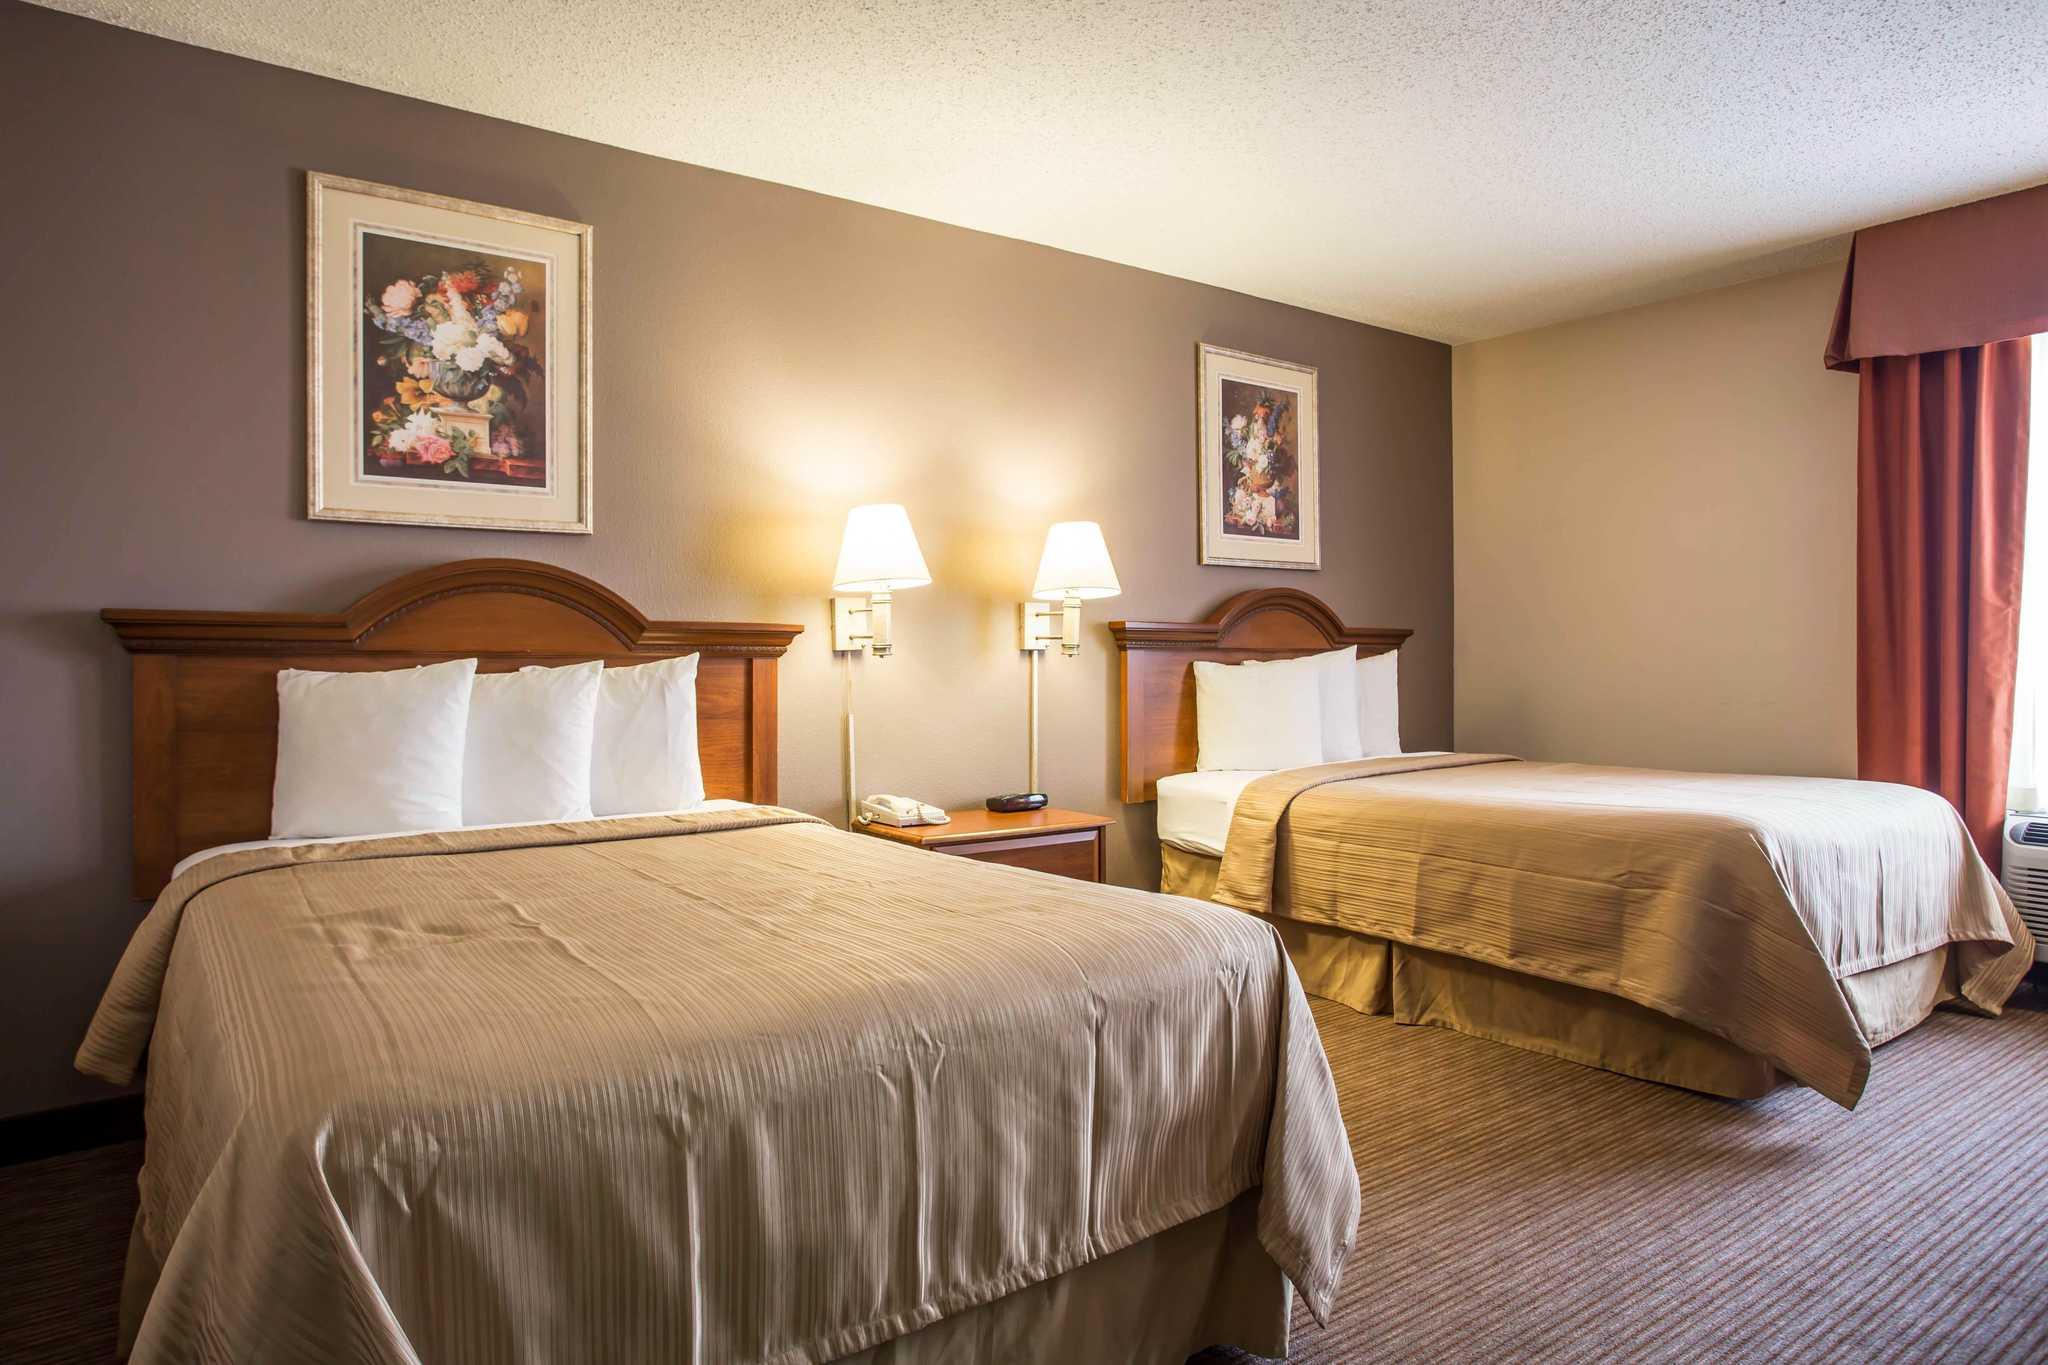 Quality Inn & Suites Matthews - Charlotte image 3